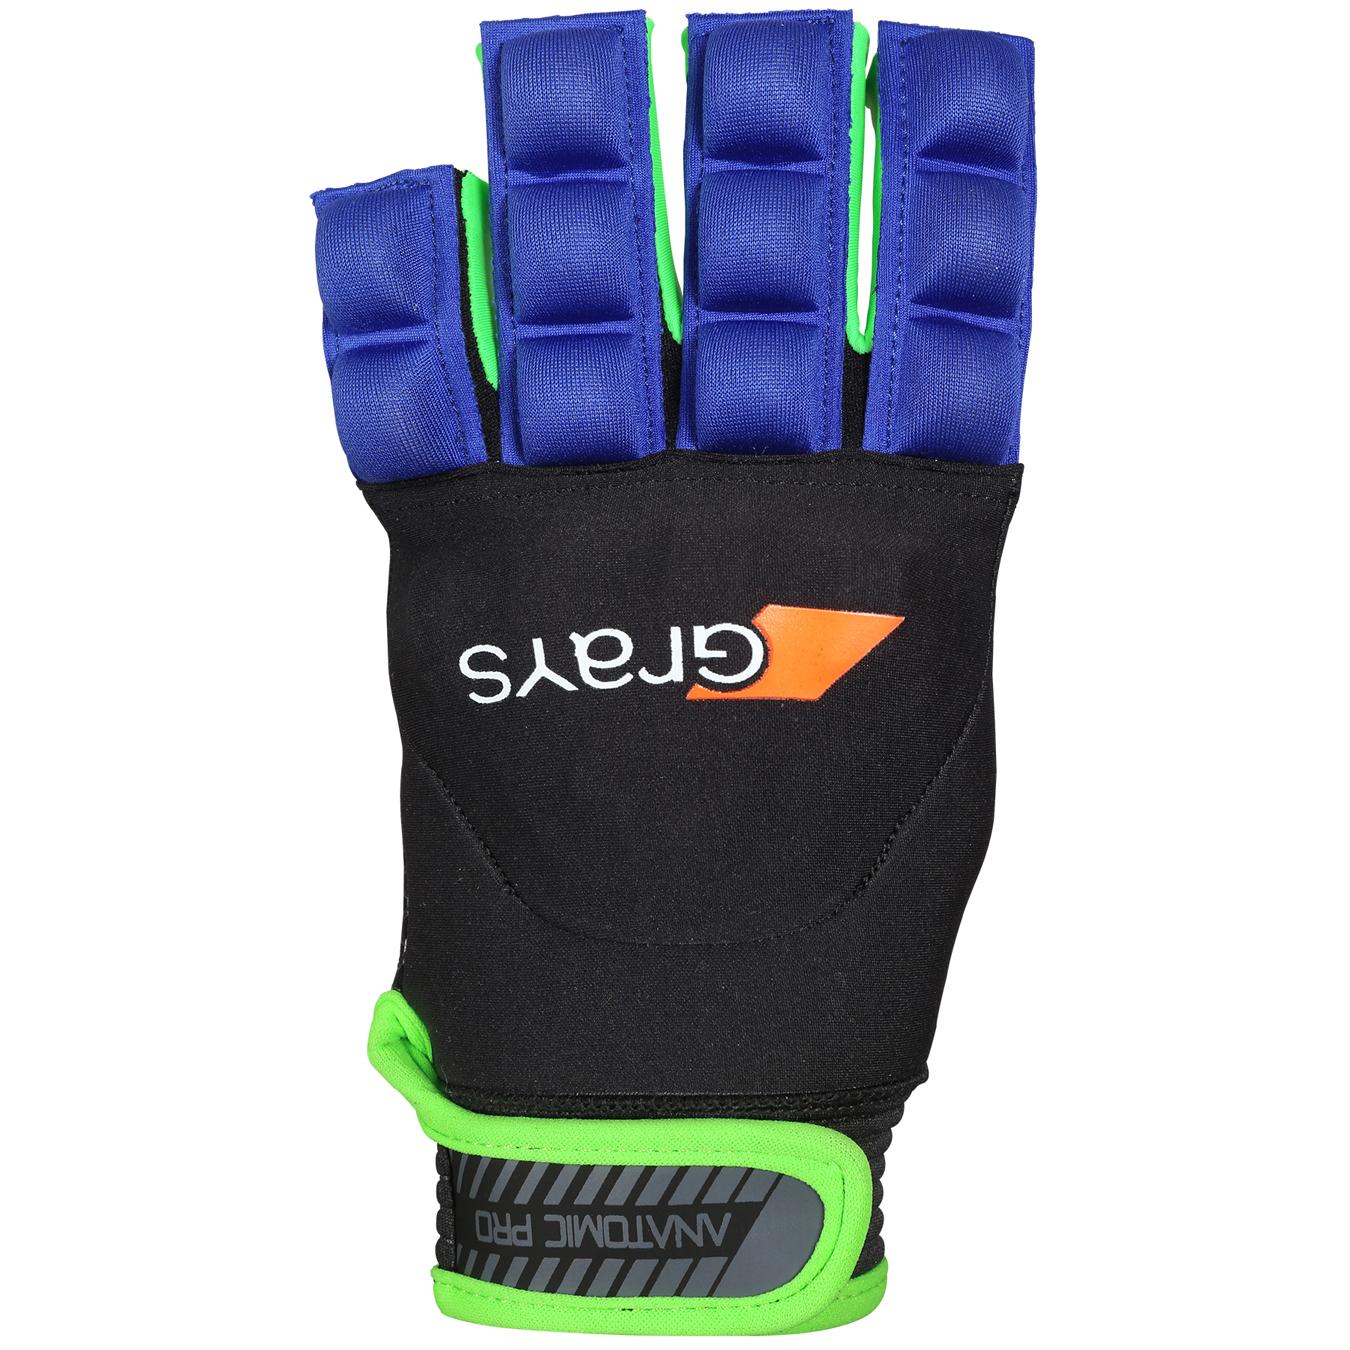 Anatomic Pro Glove Links Blauw groen